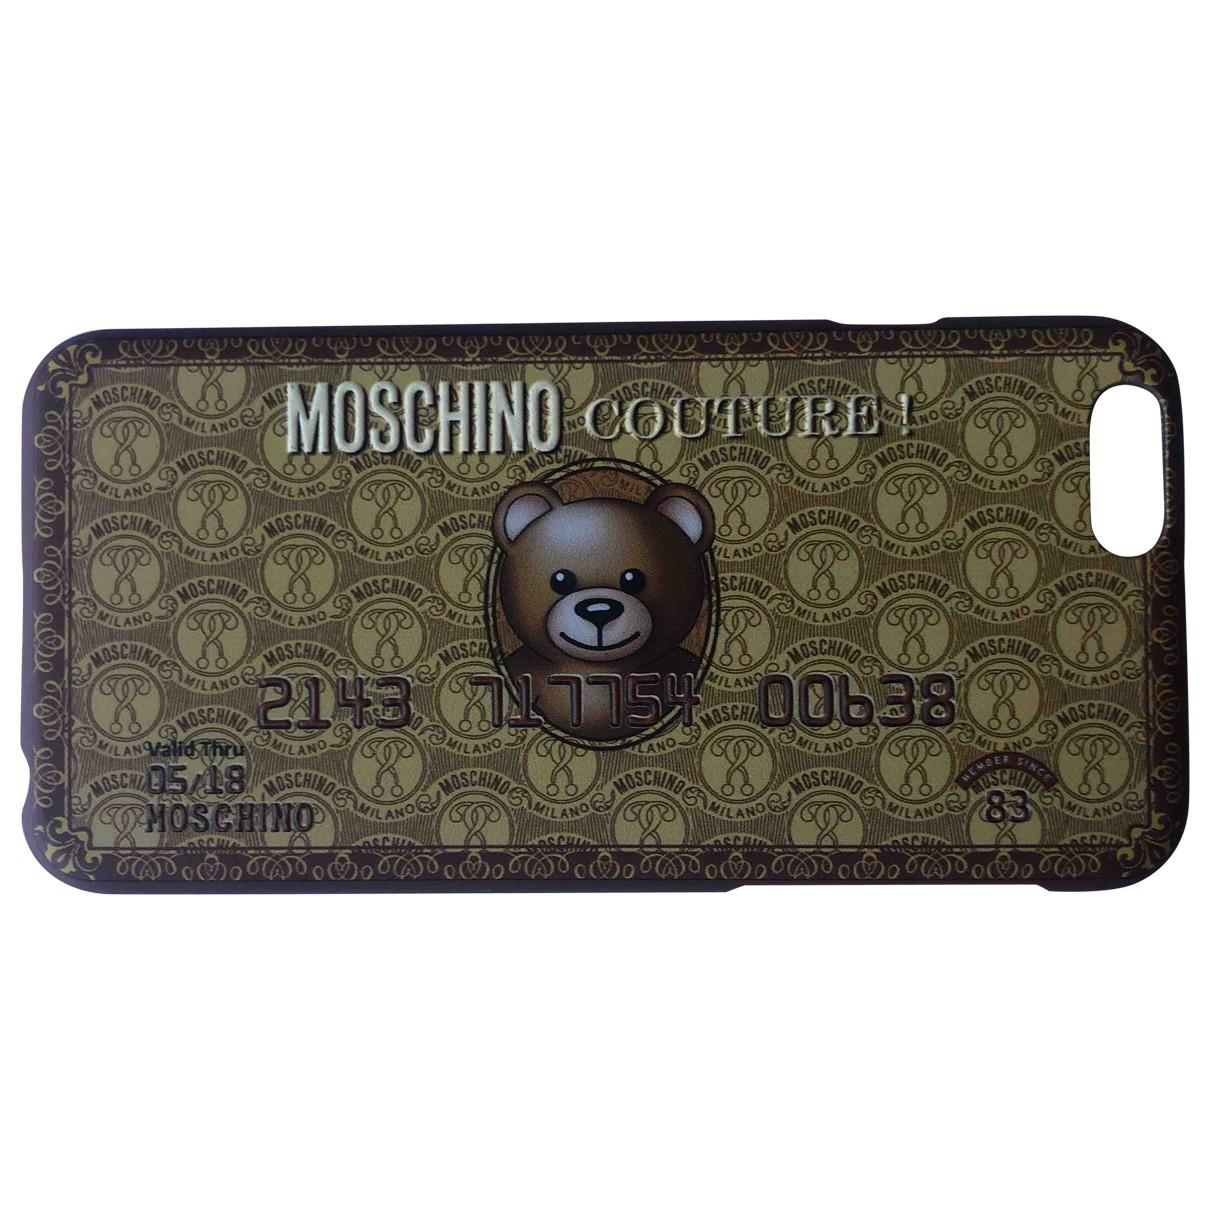 Moschino - Accessoires   pour lifestyle - marron